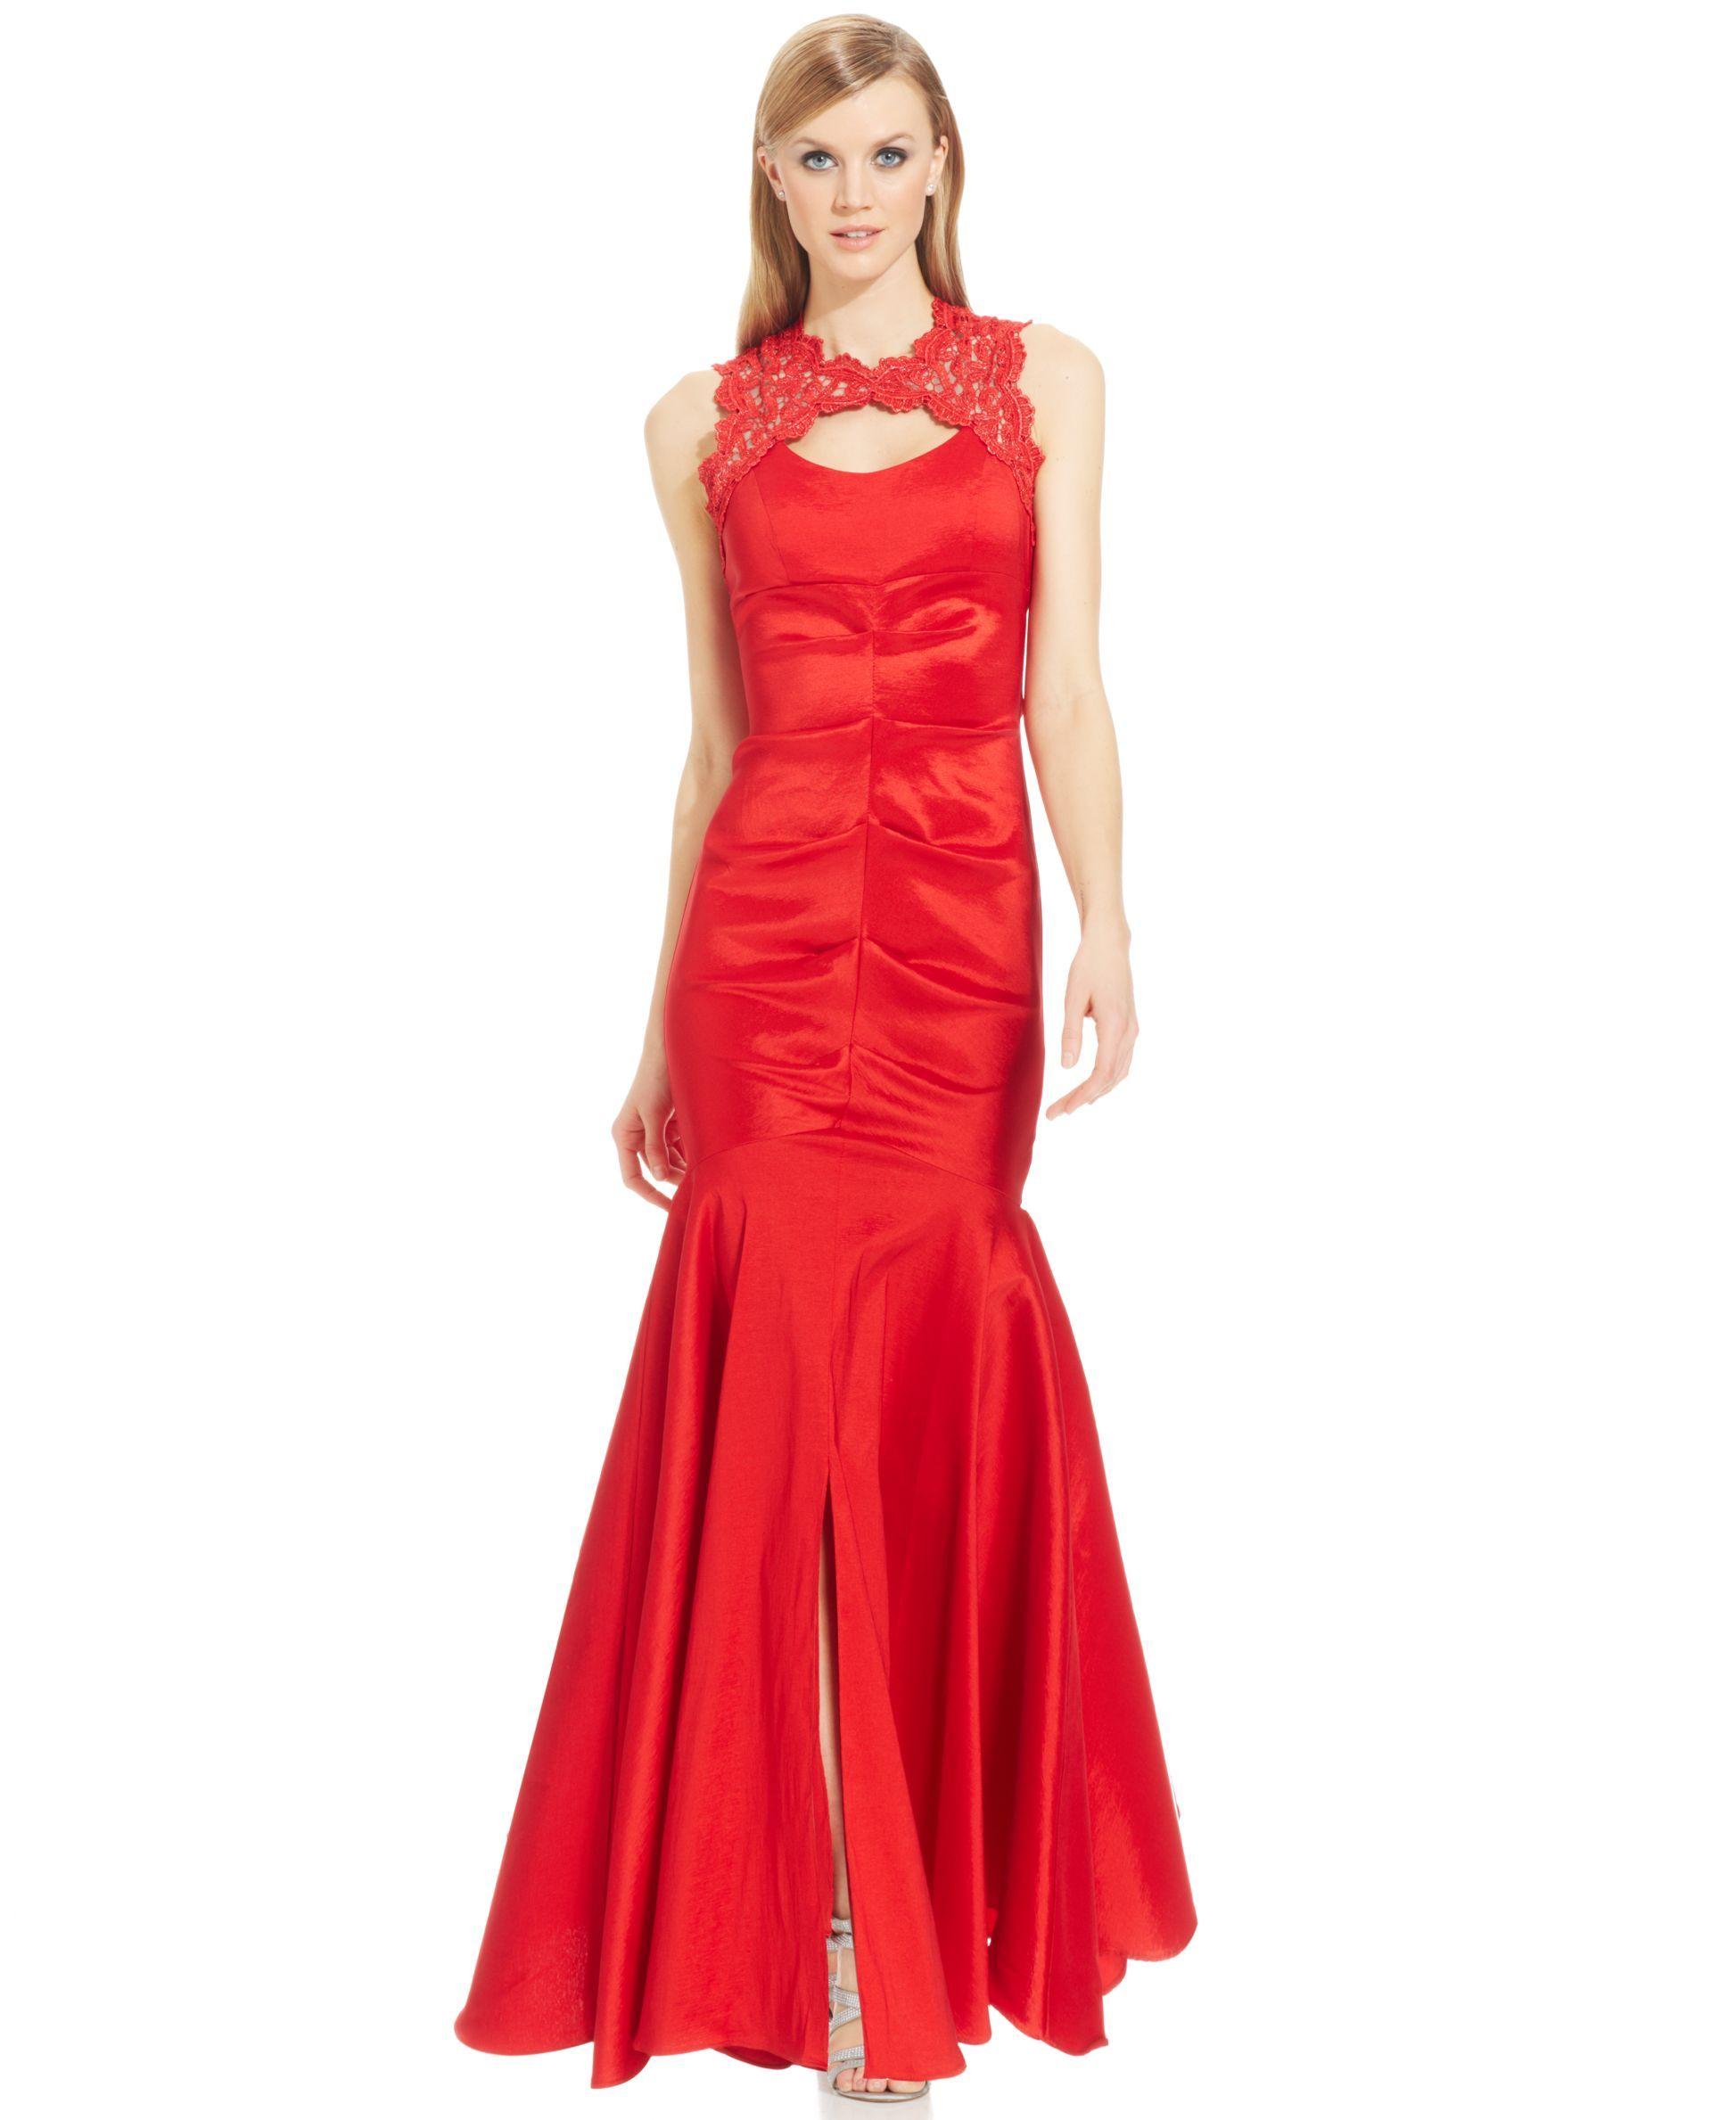 Xscape Sleeveless Glitter Lace Mermaid Gown | fashion | Pinterest ...